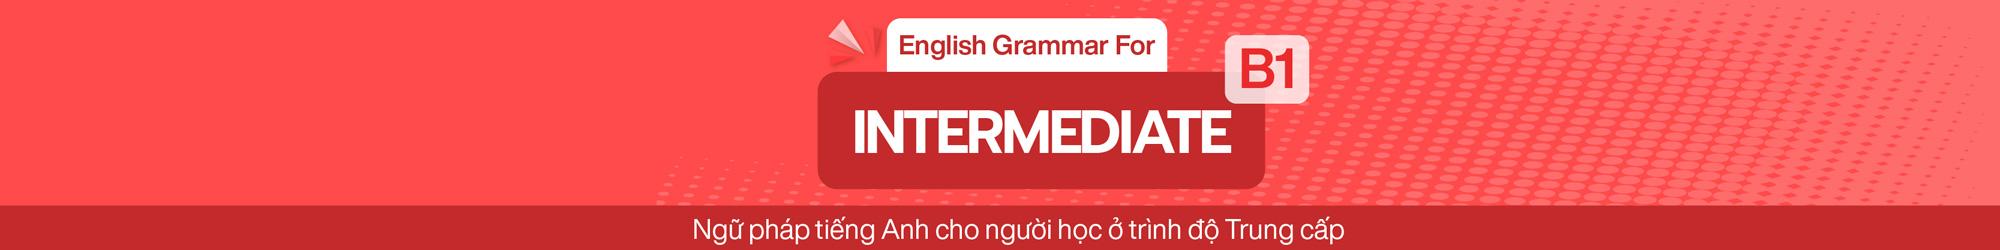 English Grammar For Intermediate (B1) banner